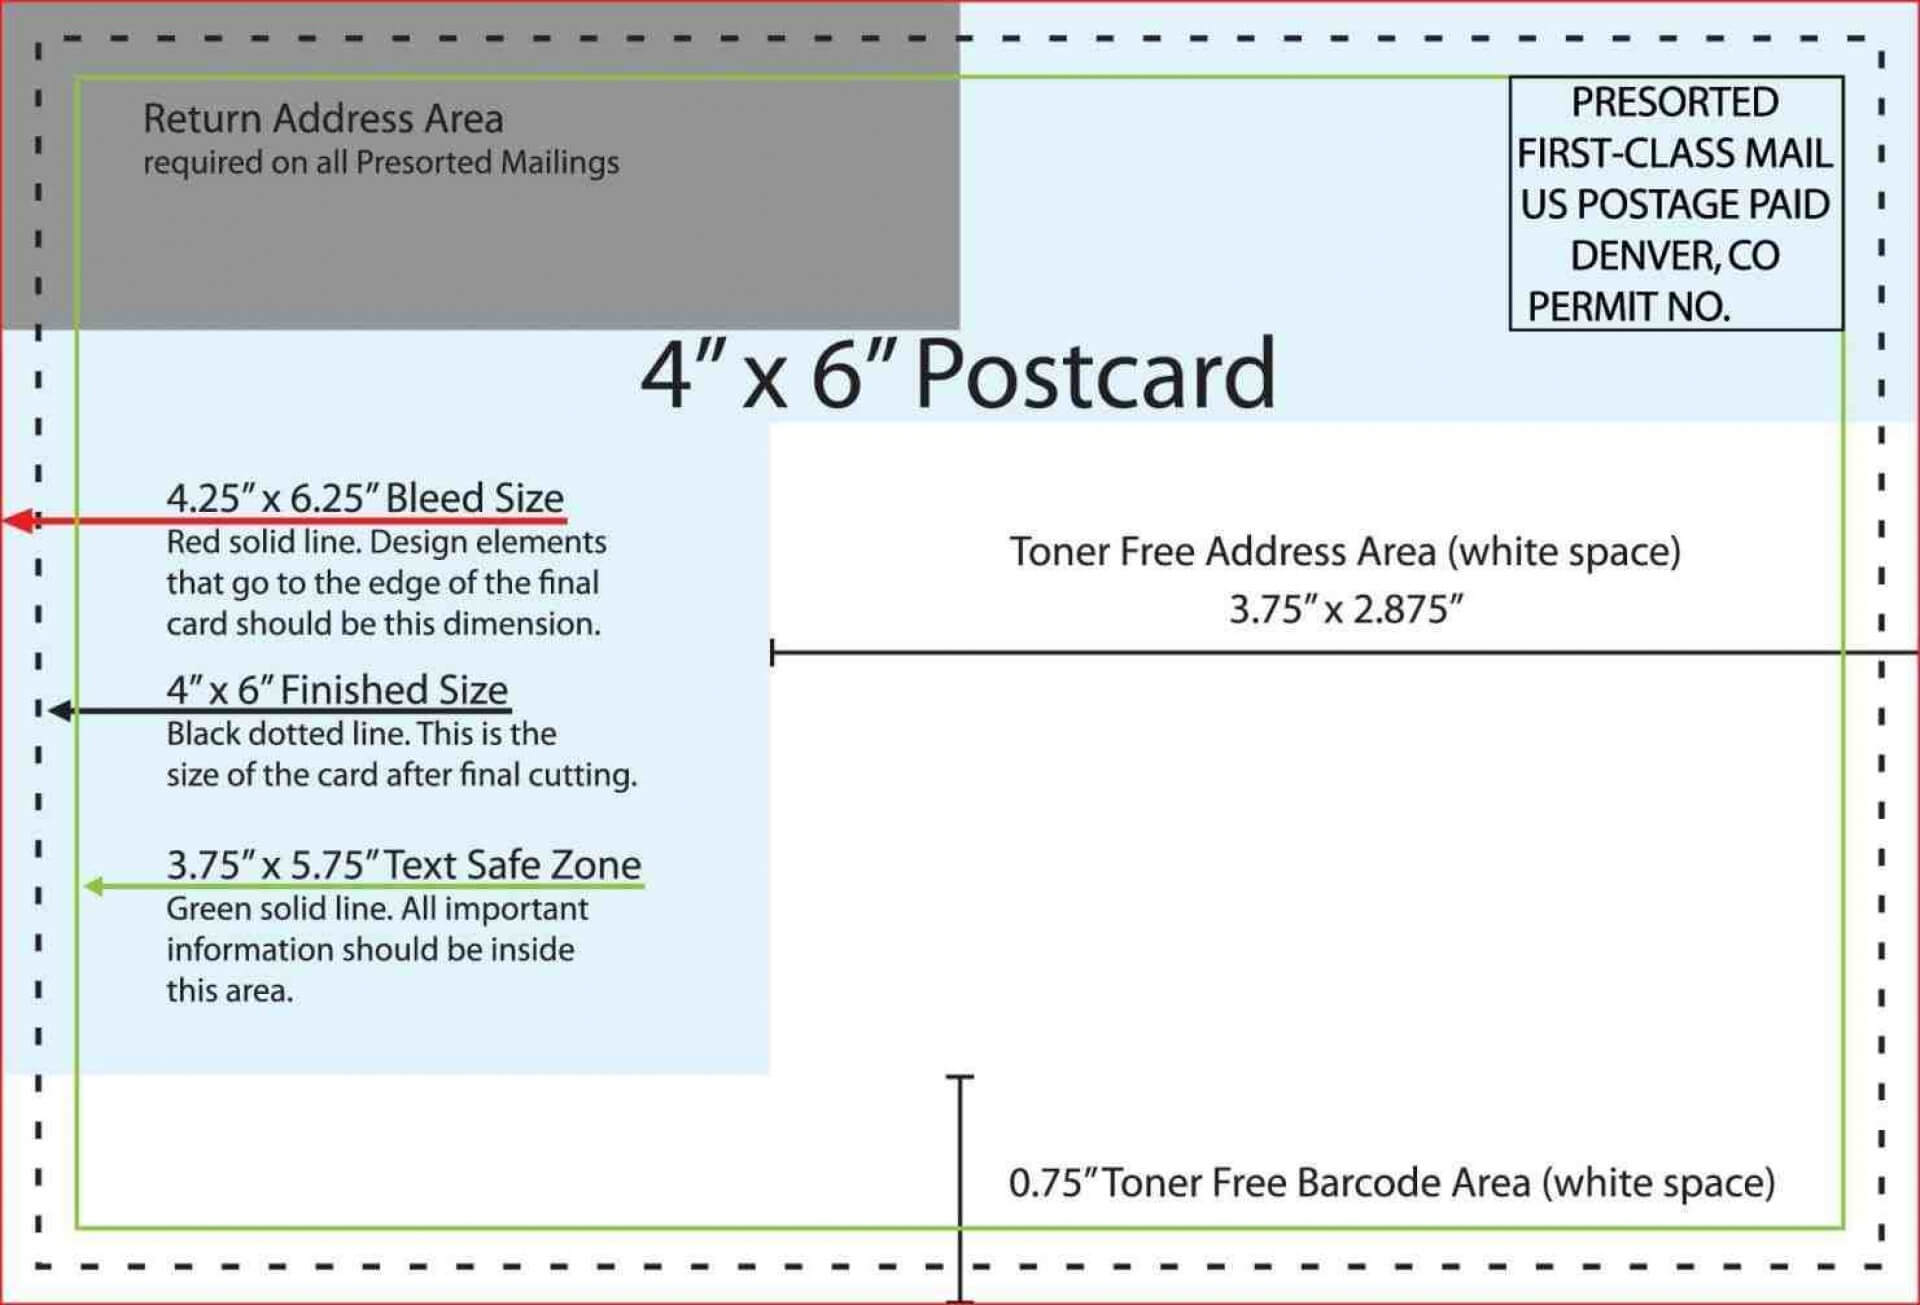 014 X Templates 4X6 Card Template Resume Postcard Black Pertaining To Microsoft Word 4X6 Postcard Template